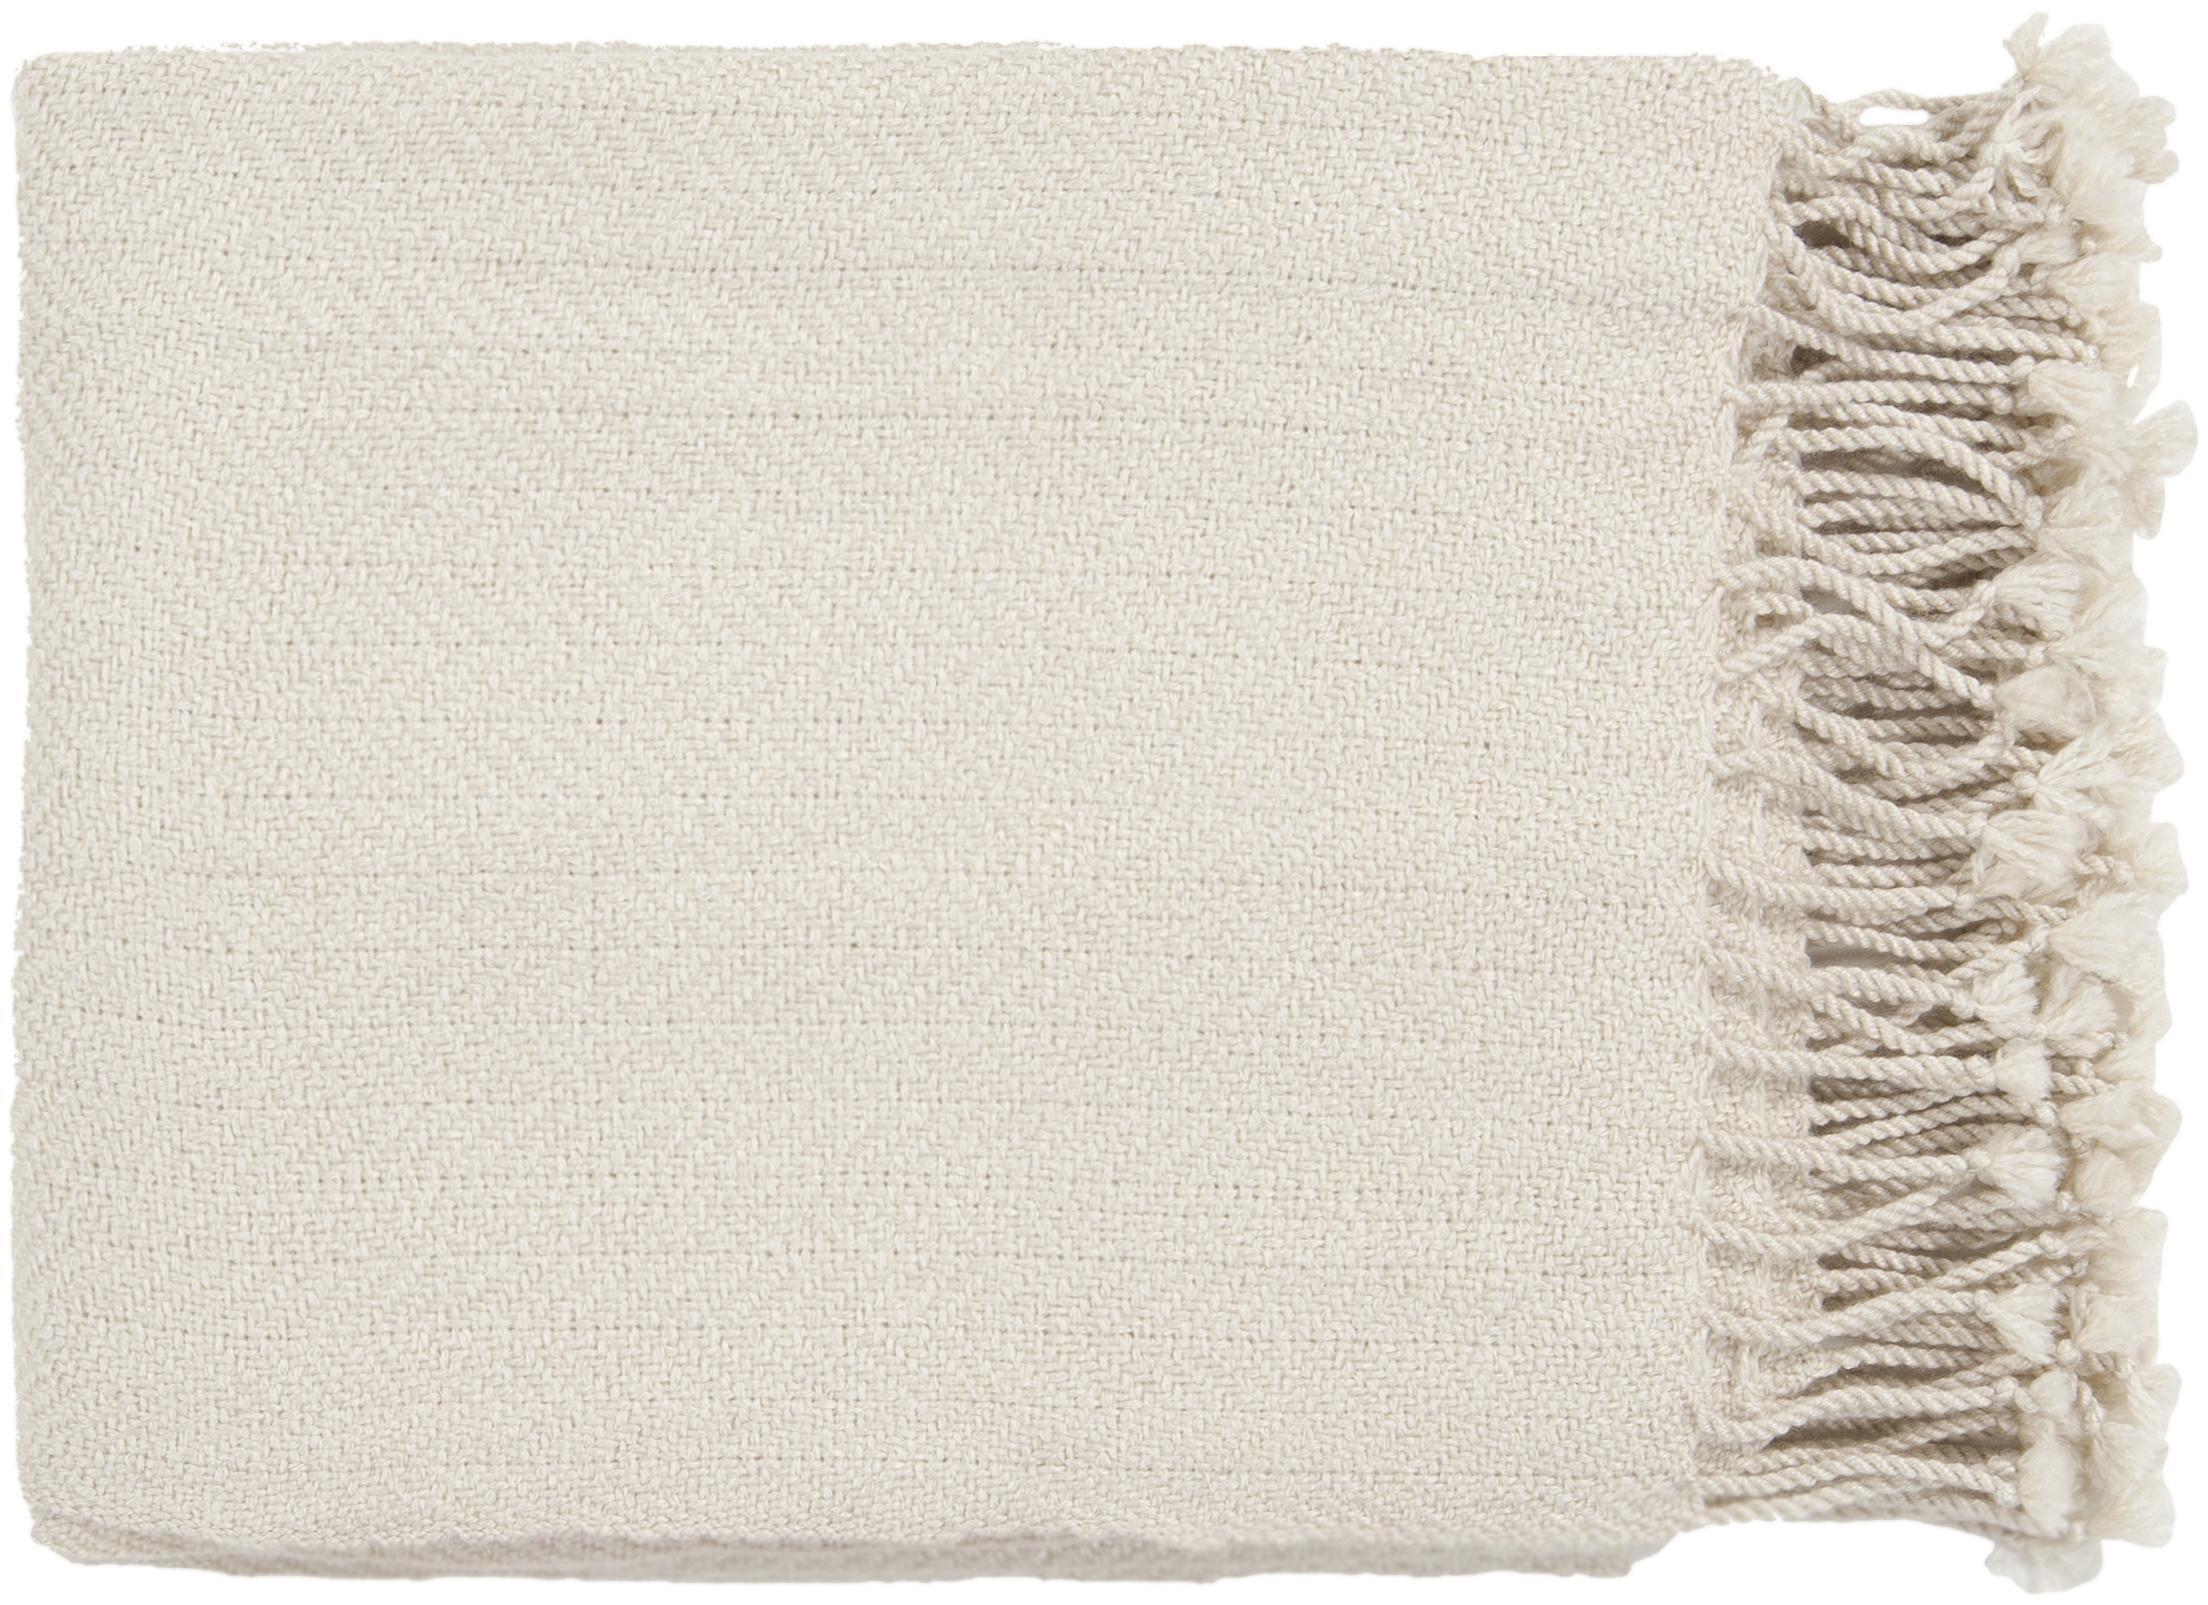 "Throw Blankets Turner 50"" x 60"" Throw by Surya at Suburban Furniture"